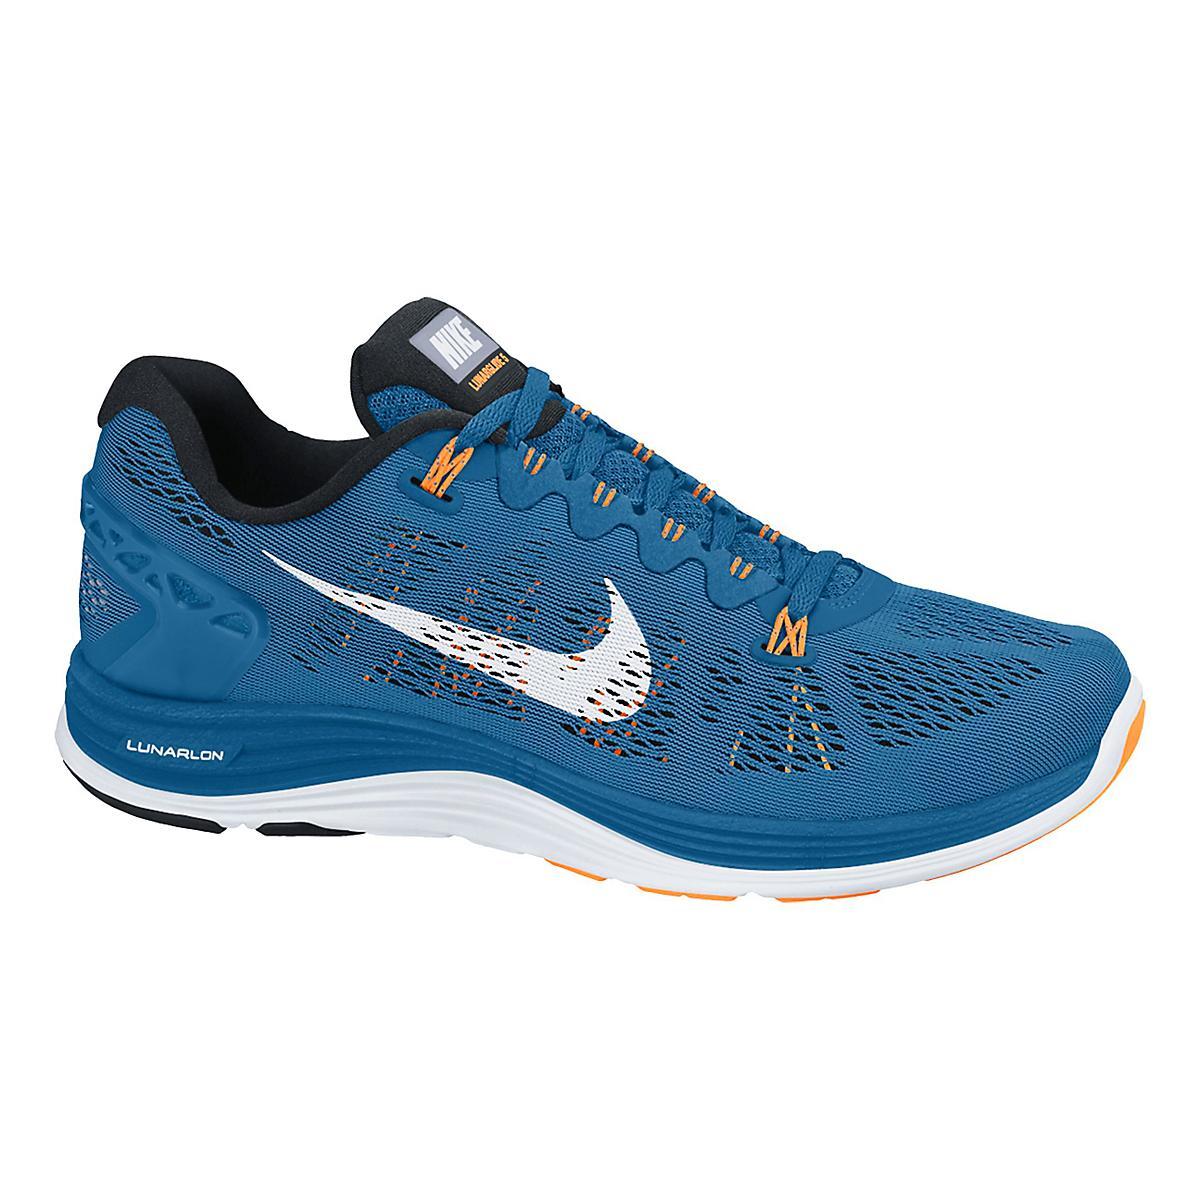 hot sale online df088 bf05e Mens Nike LunarGlide+ 5 Running Shoe at Road Runner Sports